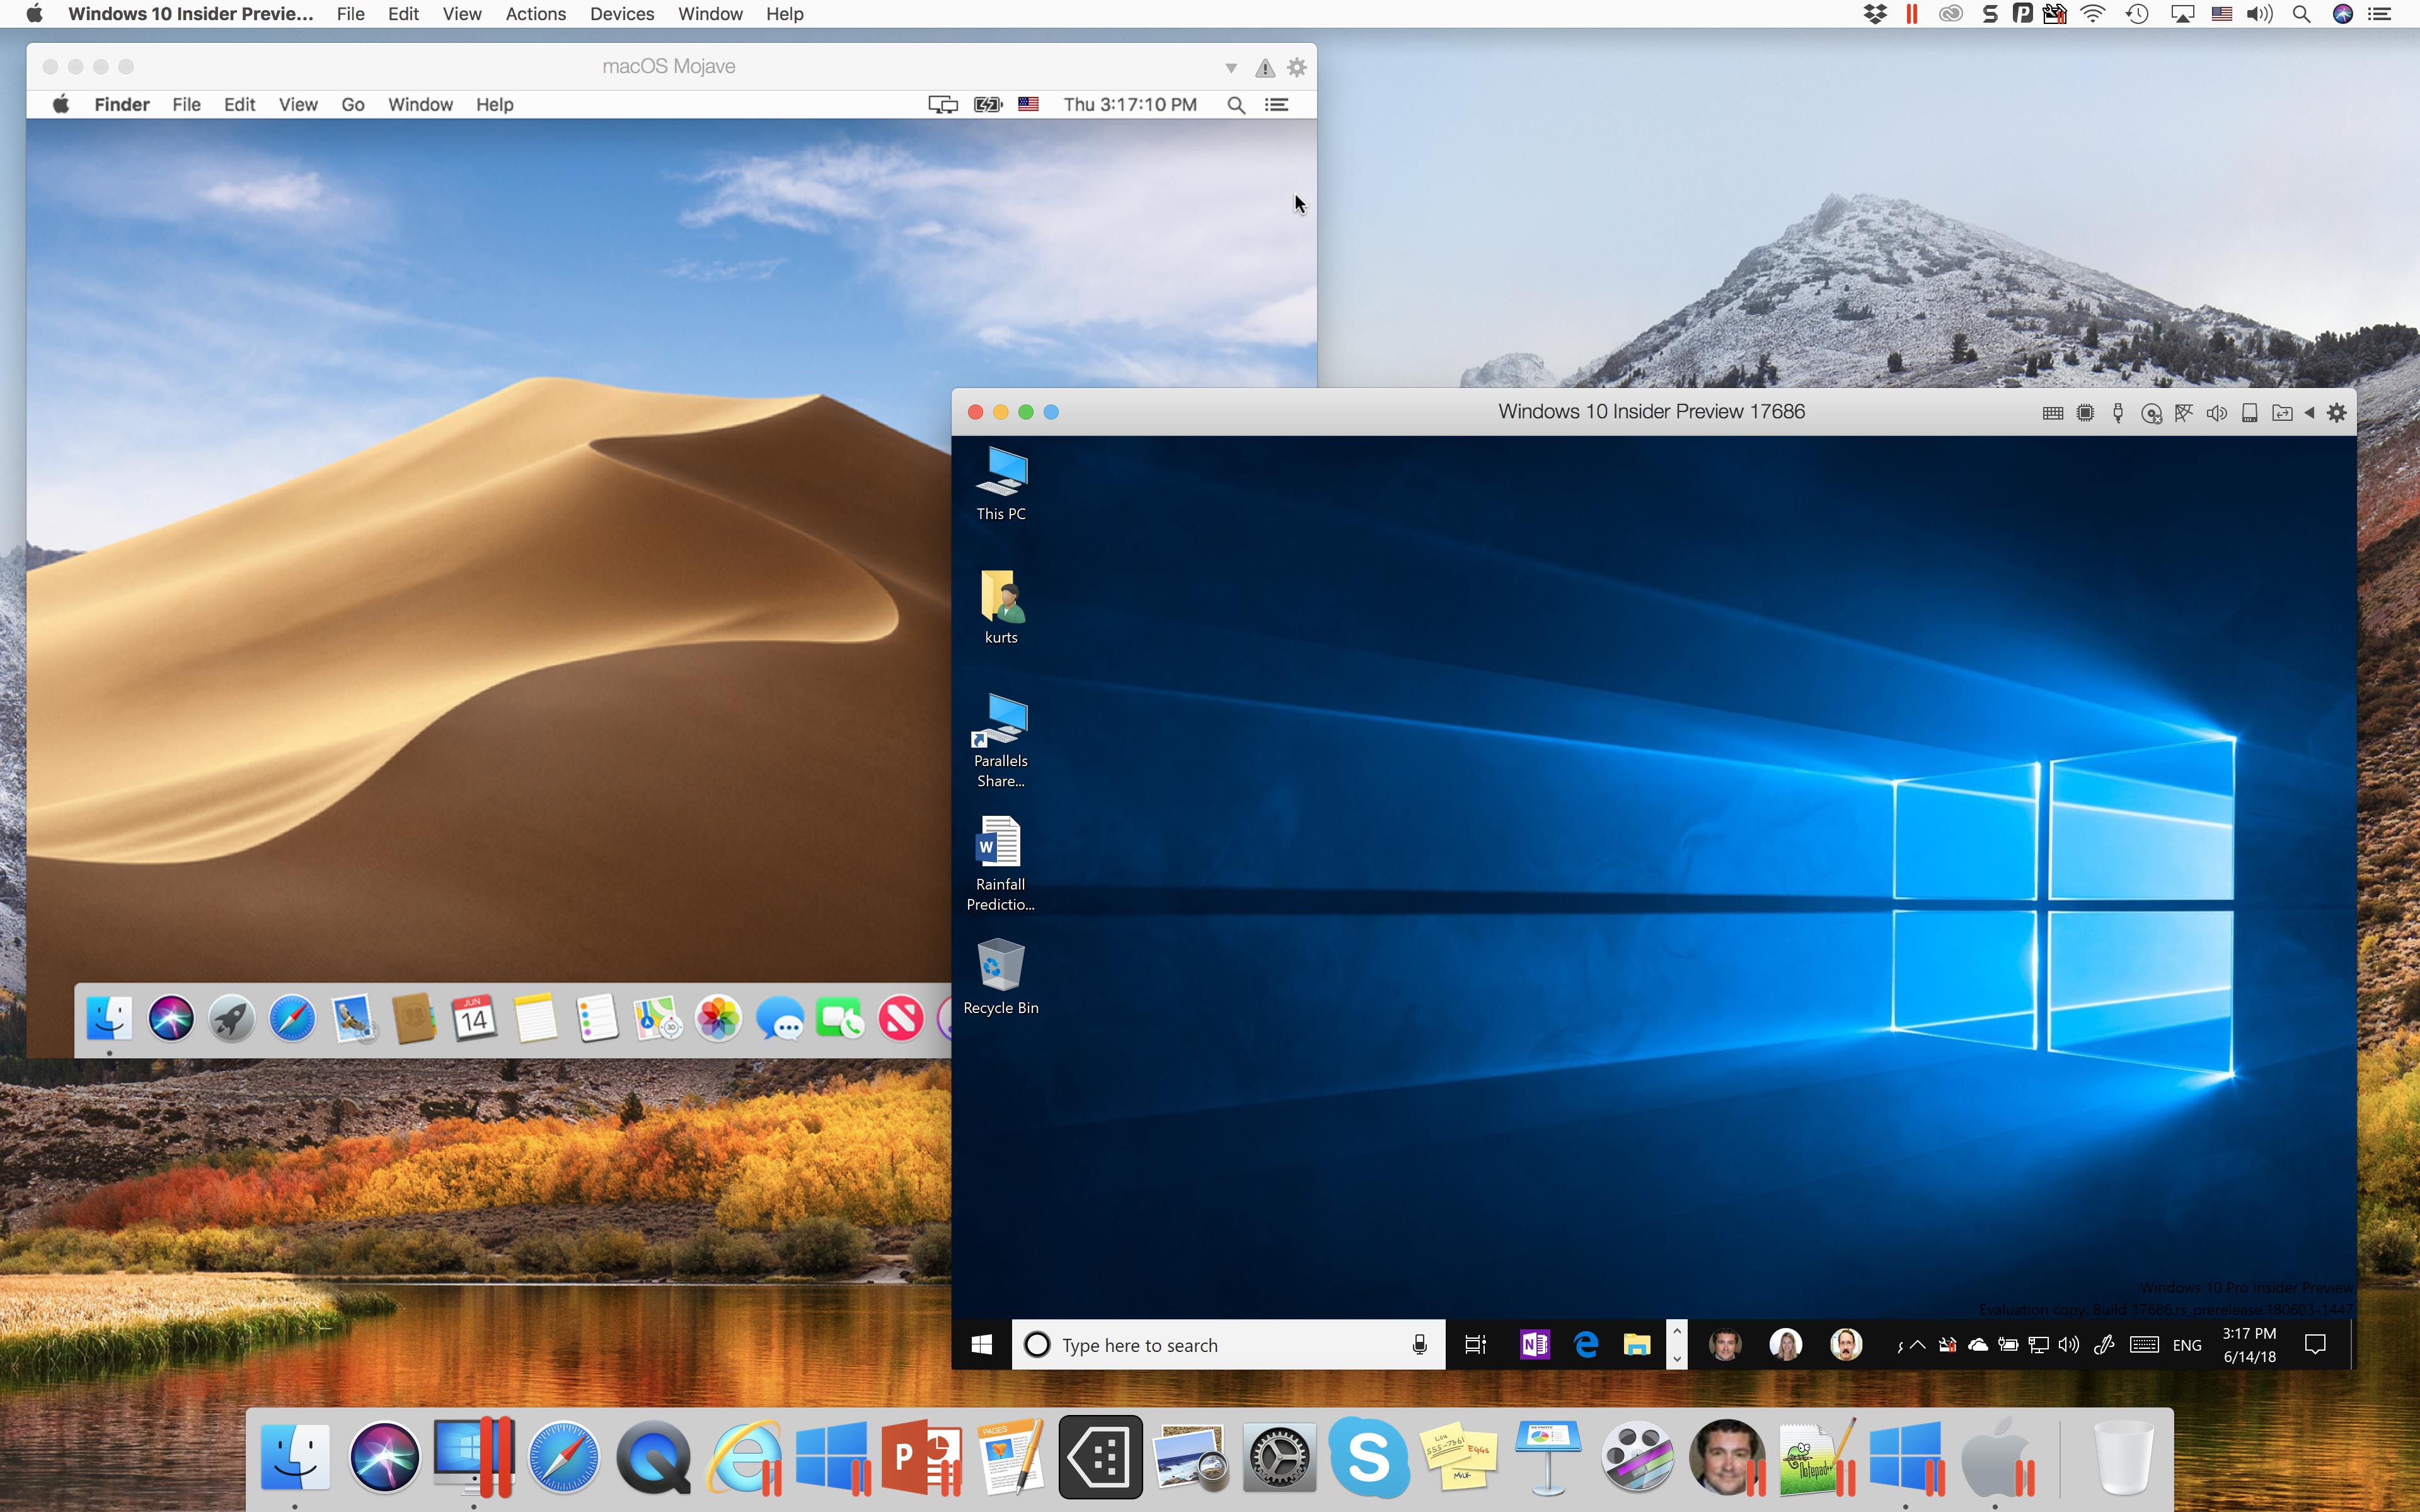 Parallels Desktop 14 for Mac 正式推出,改善啟動時間及節省更多儲存空間